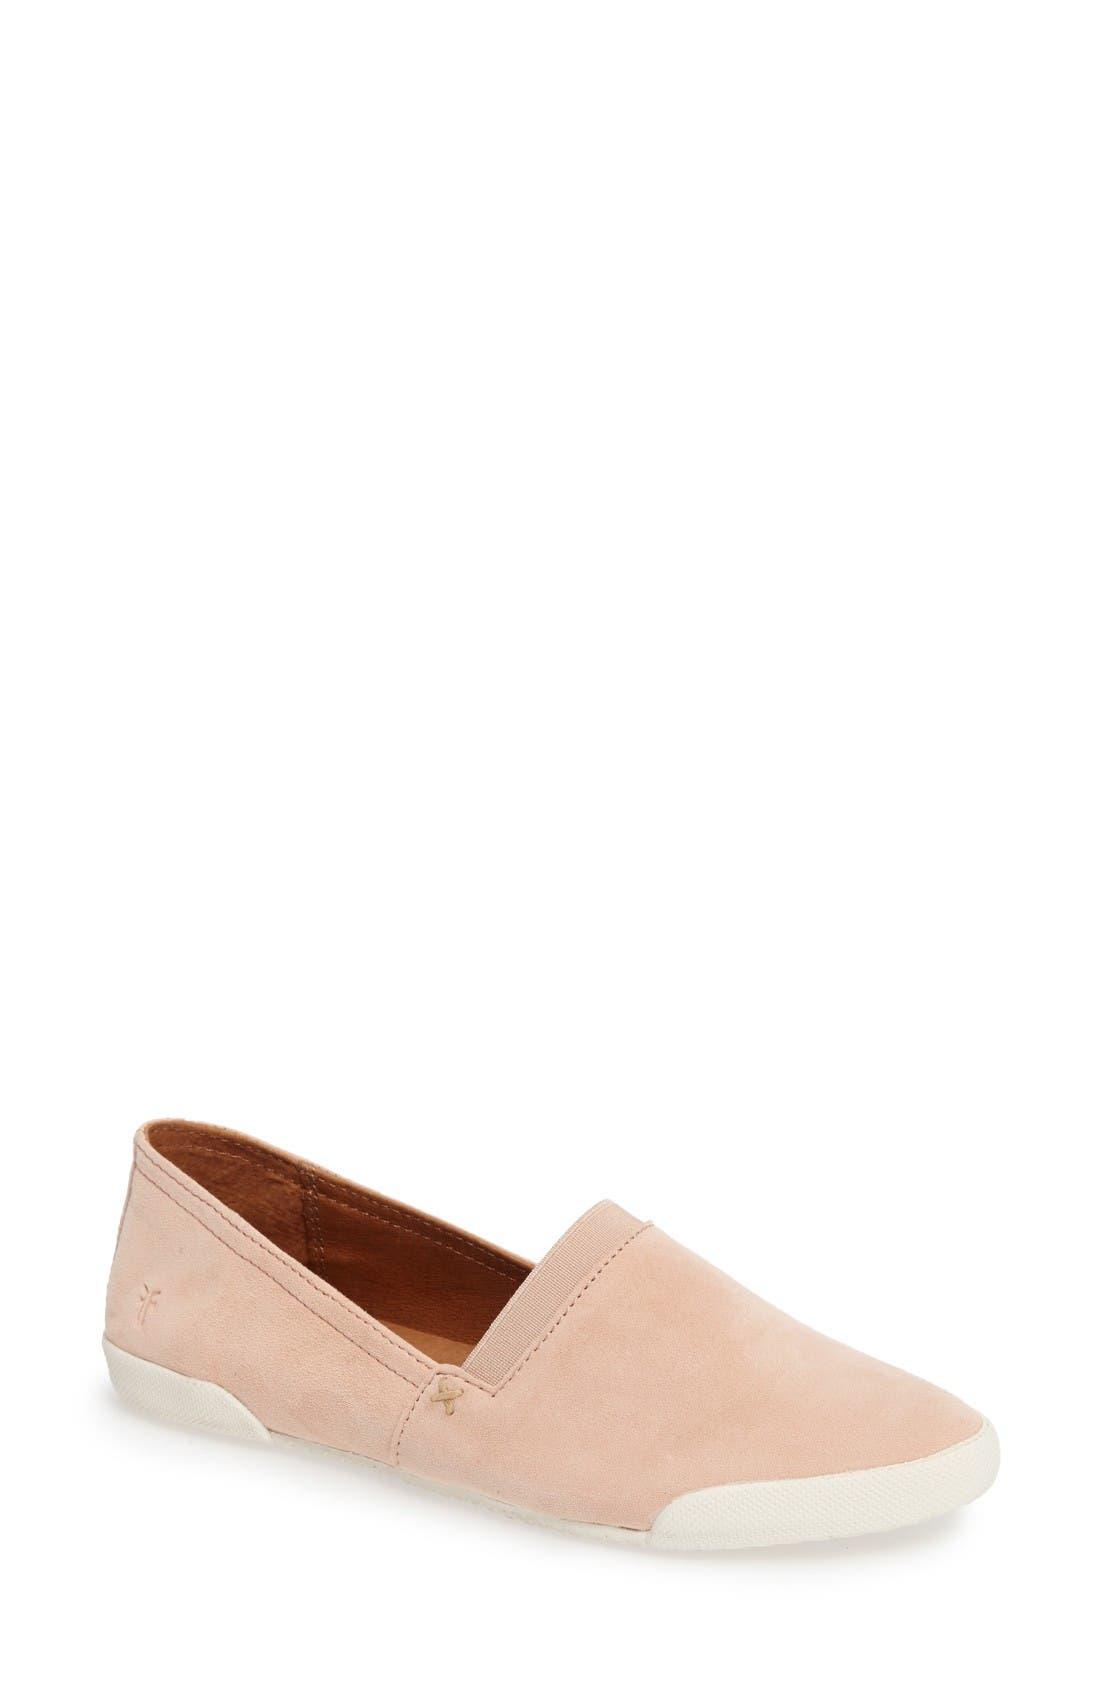 Frye 'Melanie' Slip-On (Women) (Regular Retail Price: $157.95)